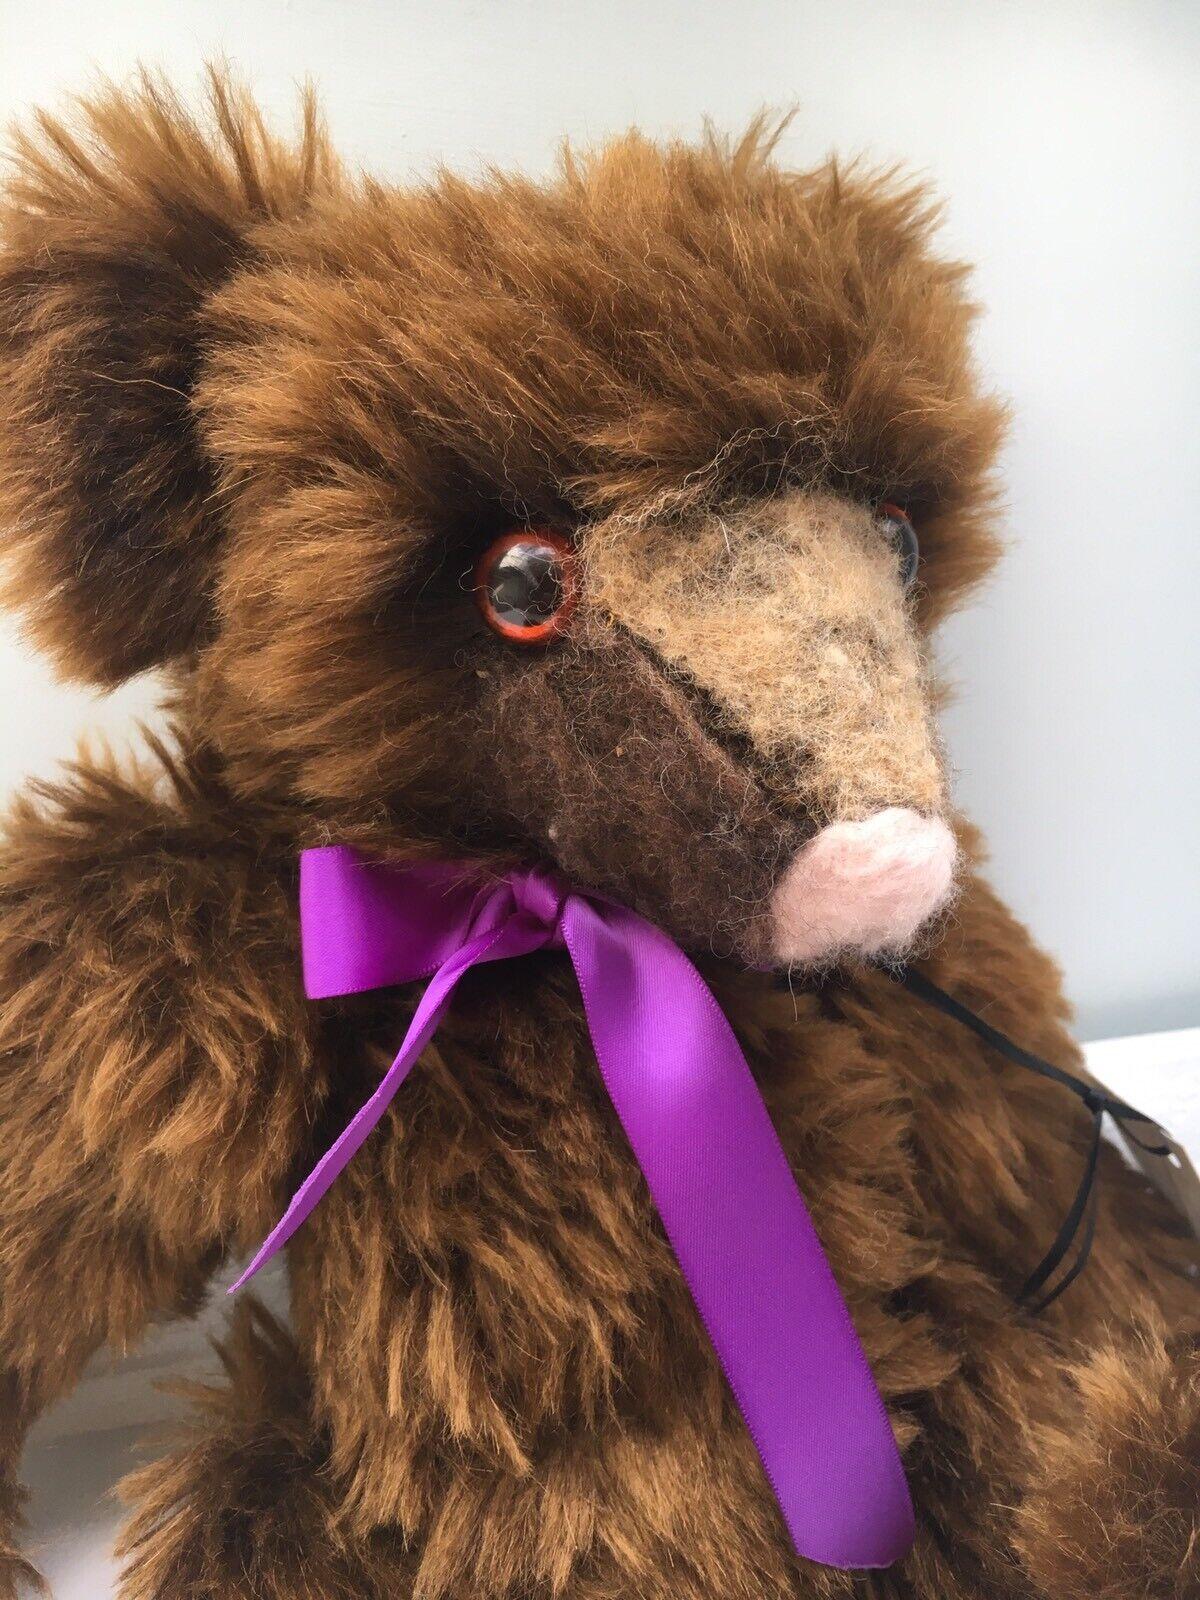 Teddy Bear-BELLISSIMA HAND MADE DA COLLEZIONE ARTIGIANALE Teddy Bear